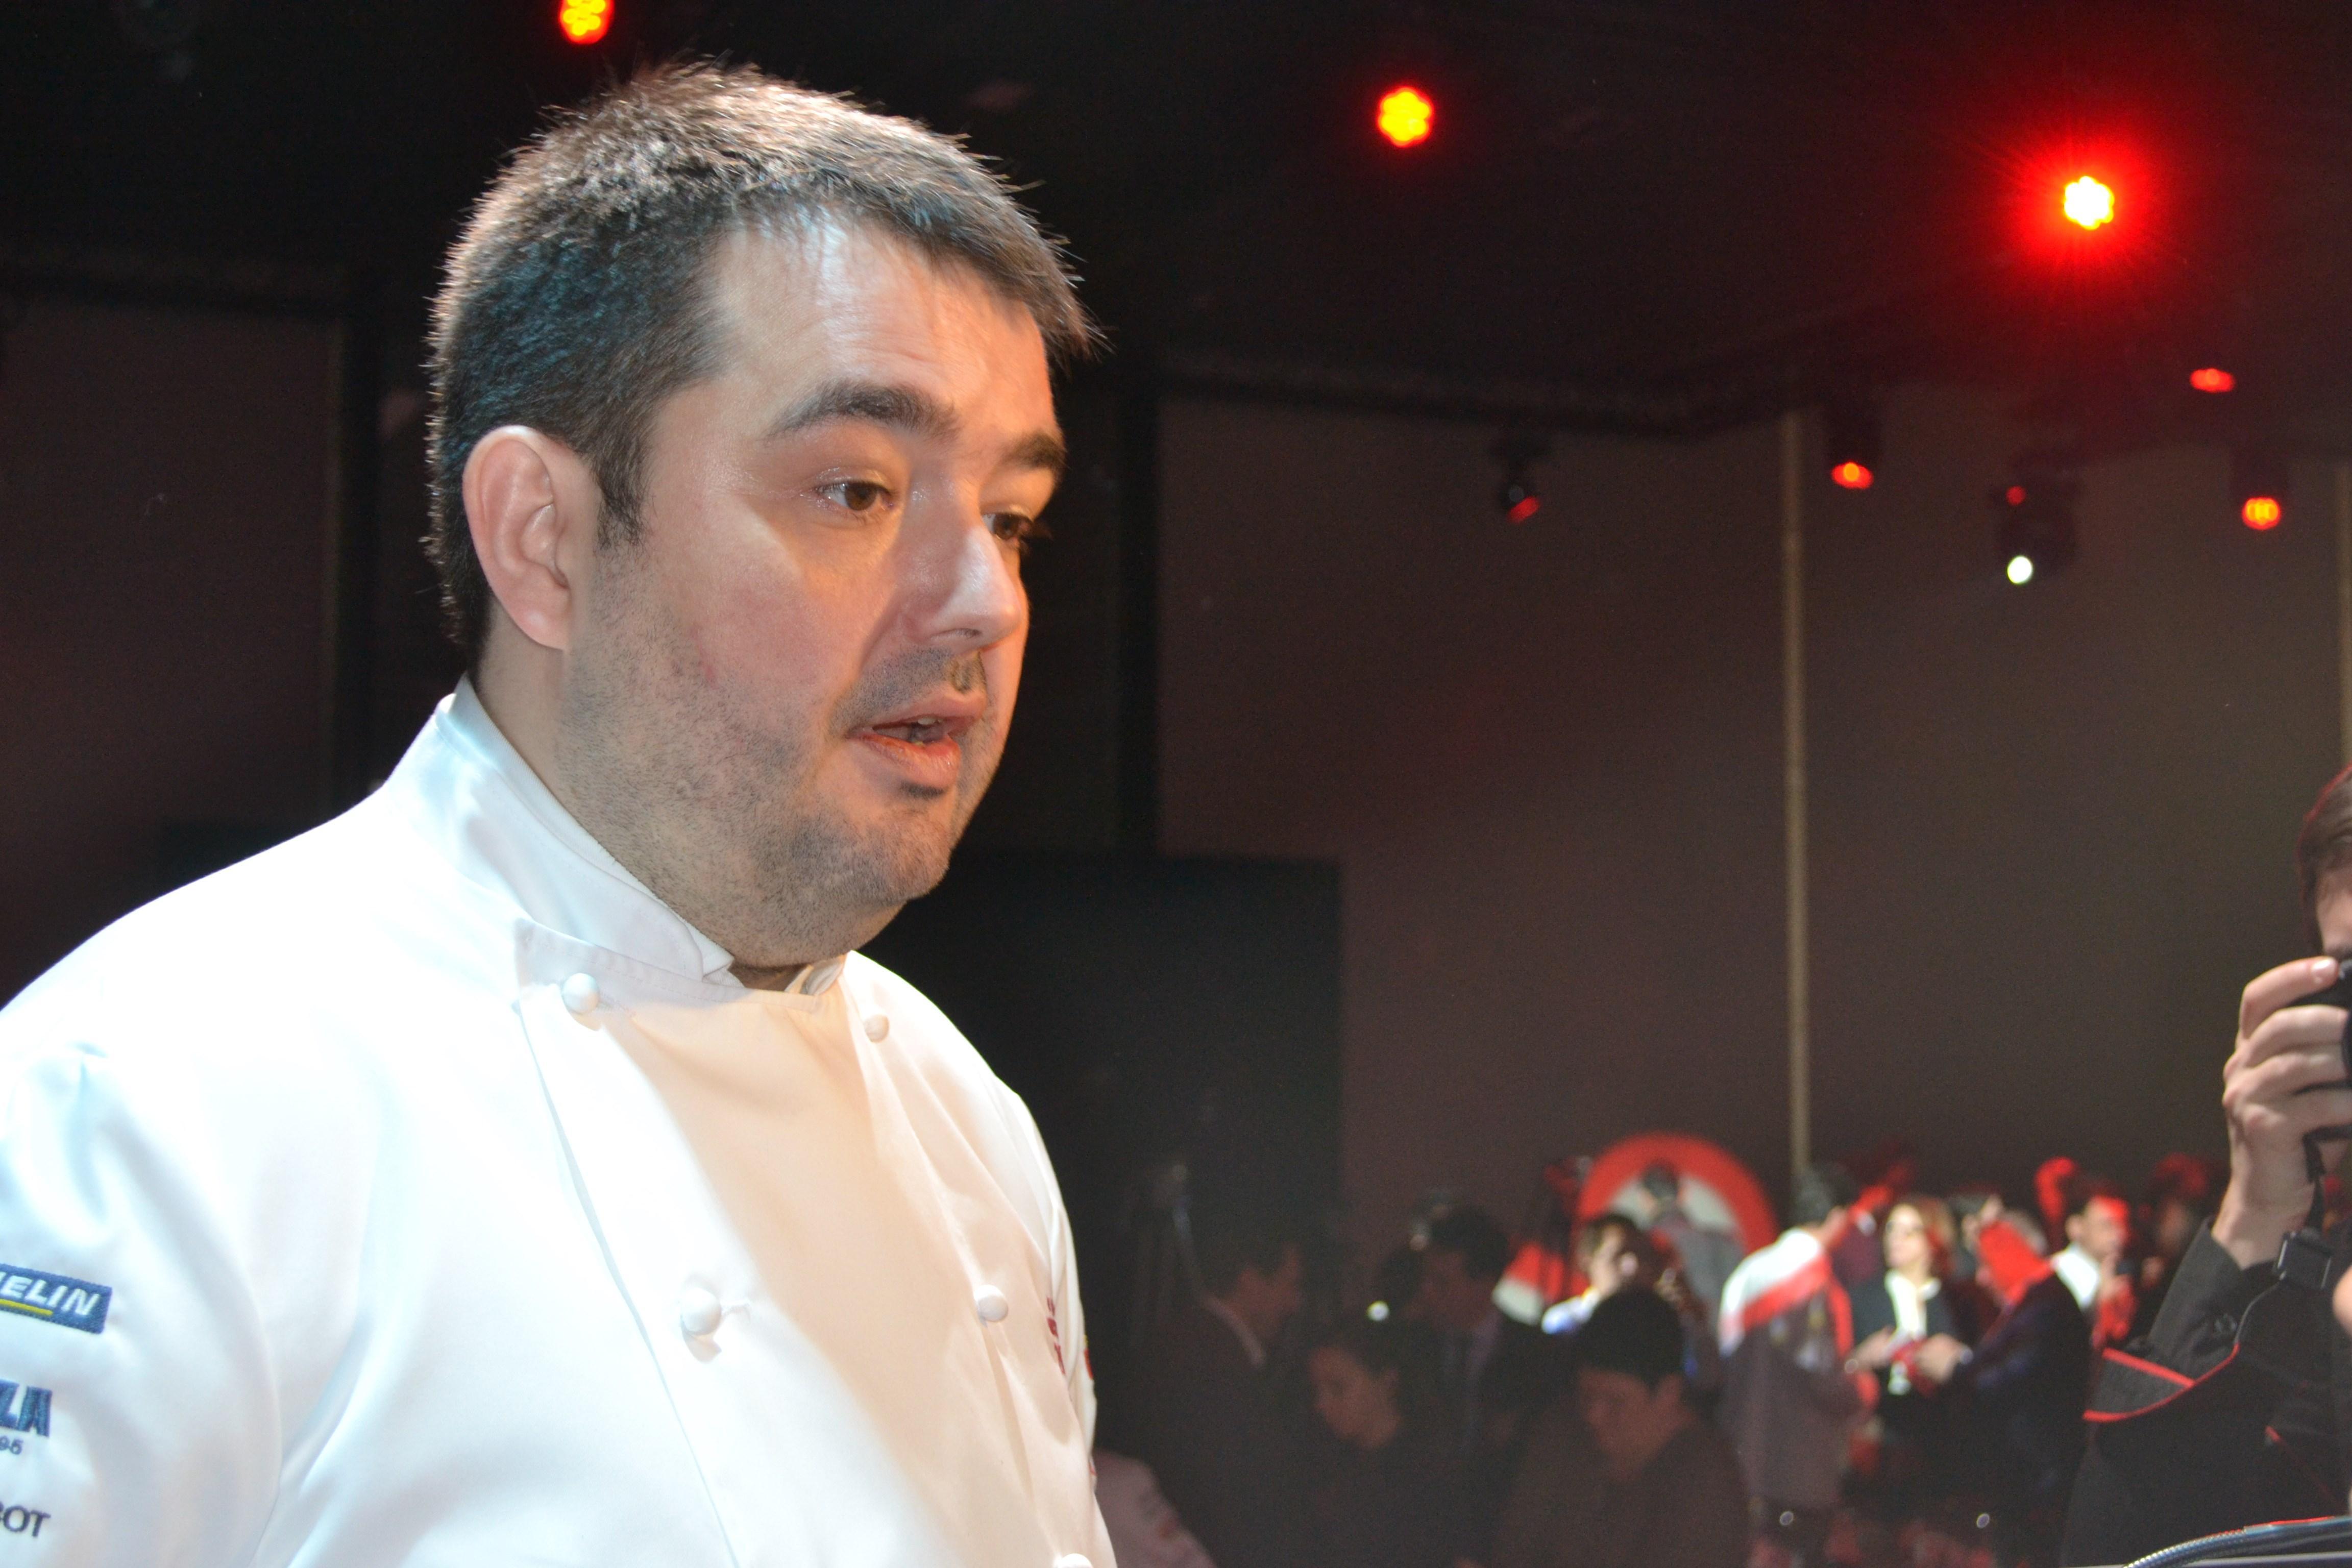 Jean-François Piège Le Grand restaurant